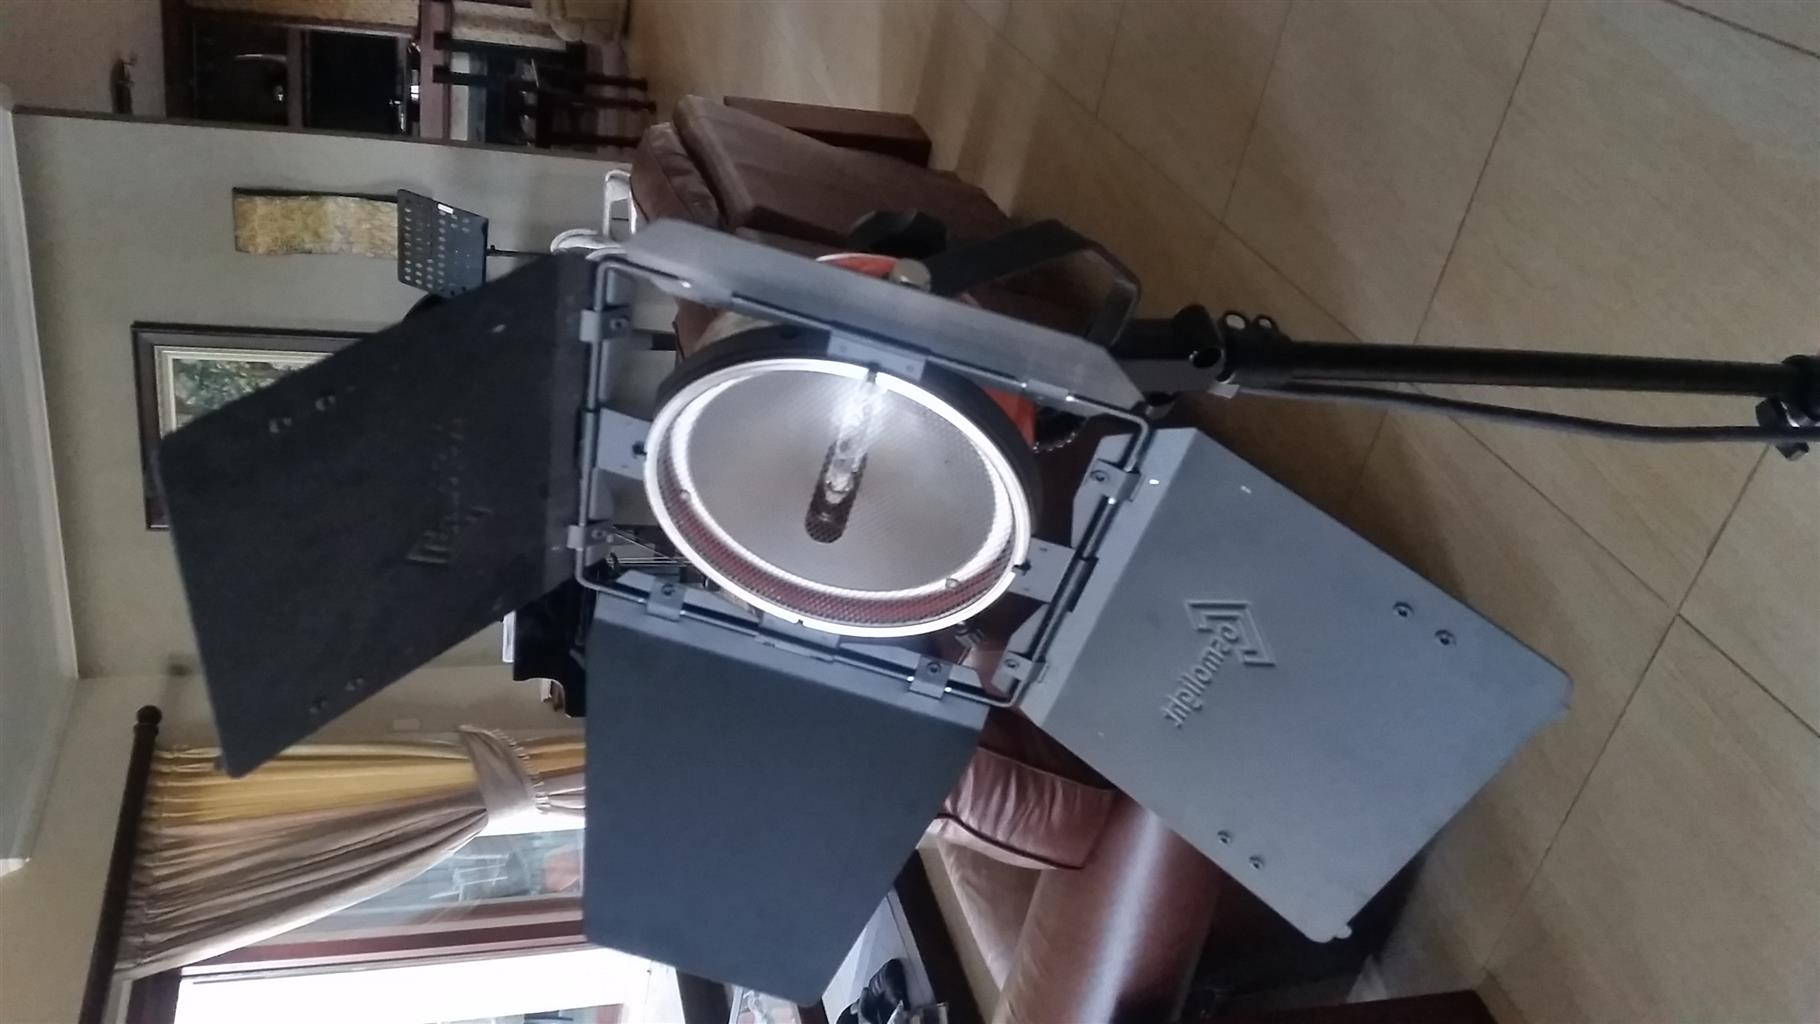 Cosmolight Cosmobeam Red-head Video-lighting kit